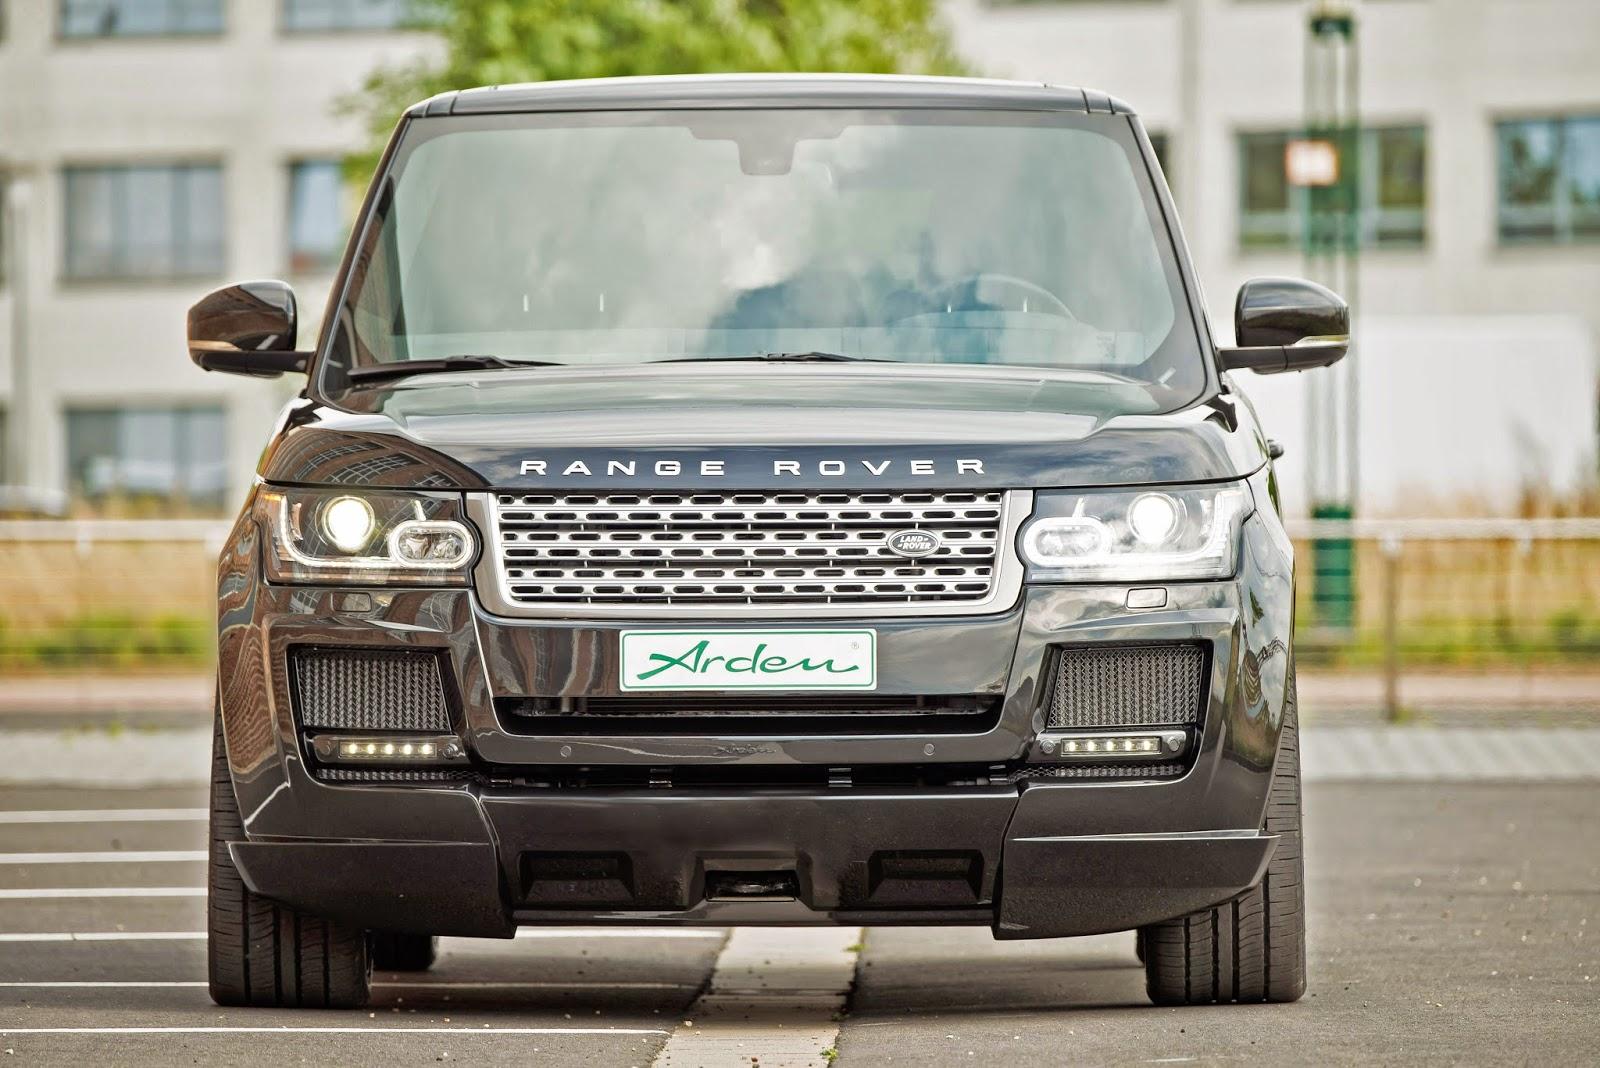 Auto-Motor-Tuning - A.M.T.: Arden Range Rover Aerodynamikpaket